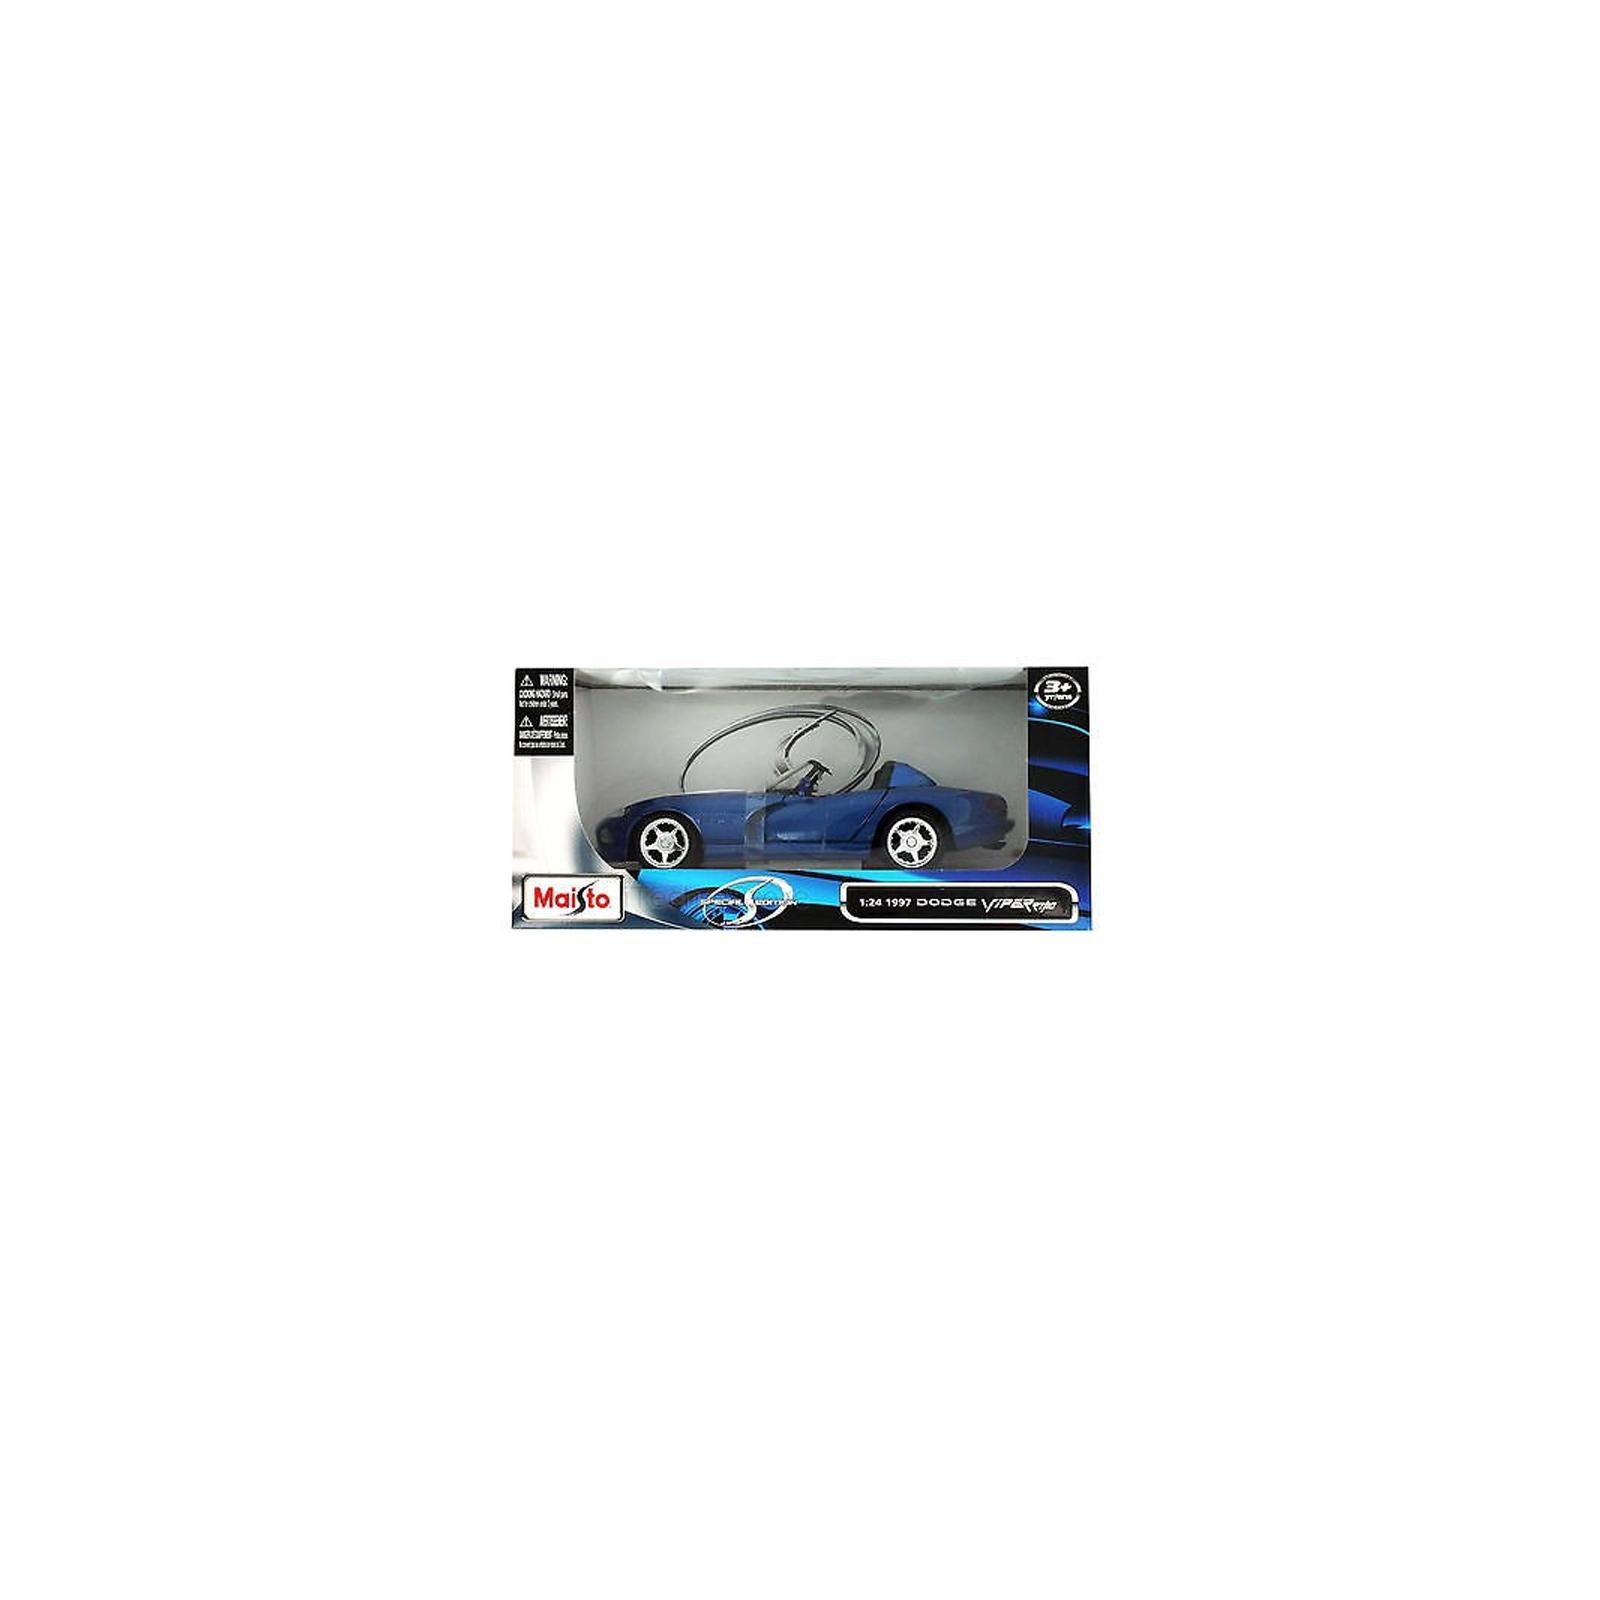 Машина Maisto Dodge Viper RT/10 '97 (1:24) синий (31932 blue) изображение 4